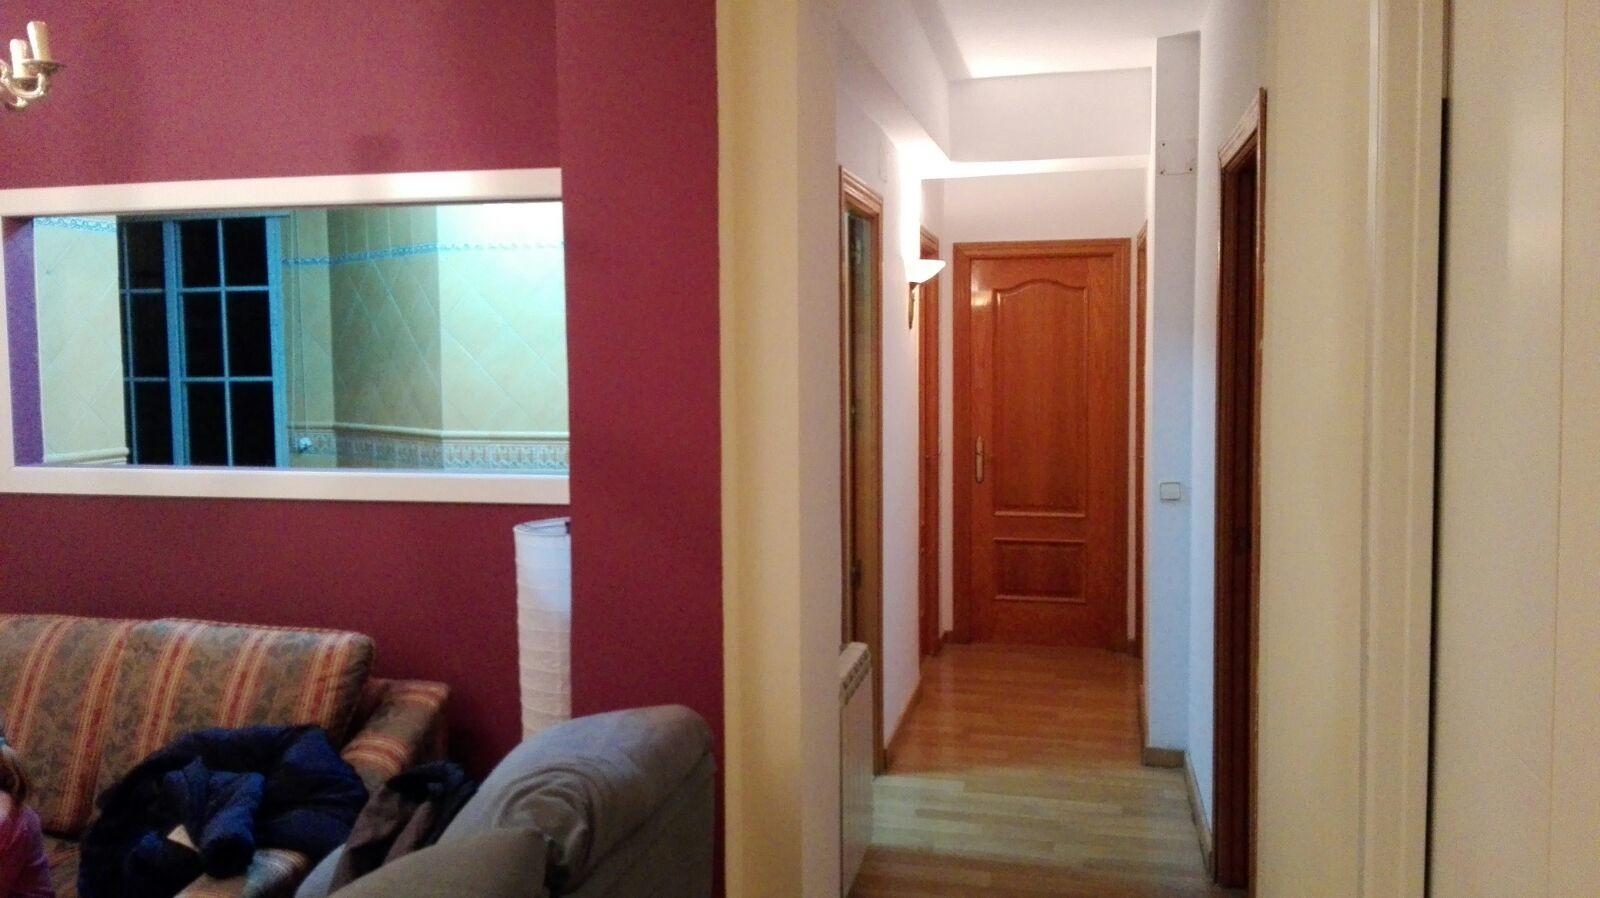 Habitacion barrio salamanca alquiler pisos madrid for Alquiler piso barrio salamanca